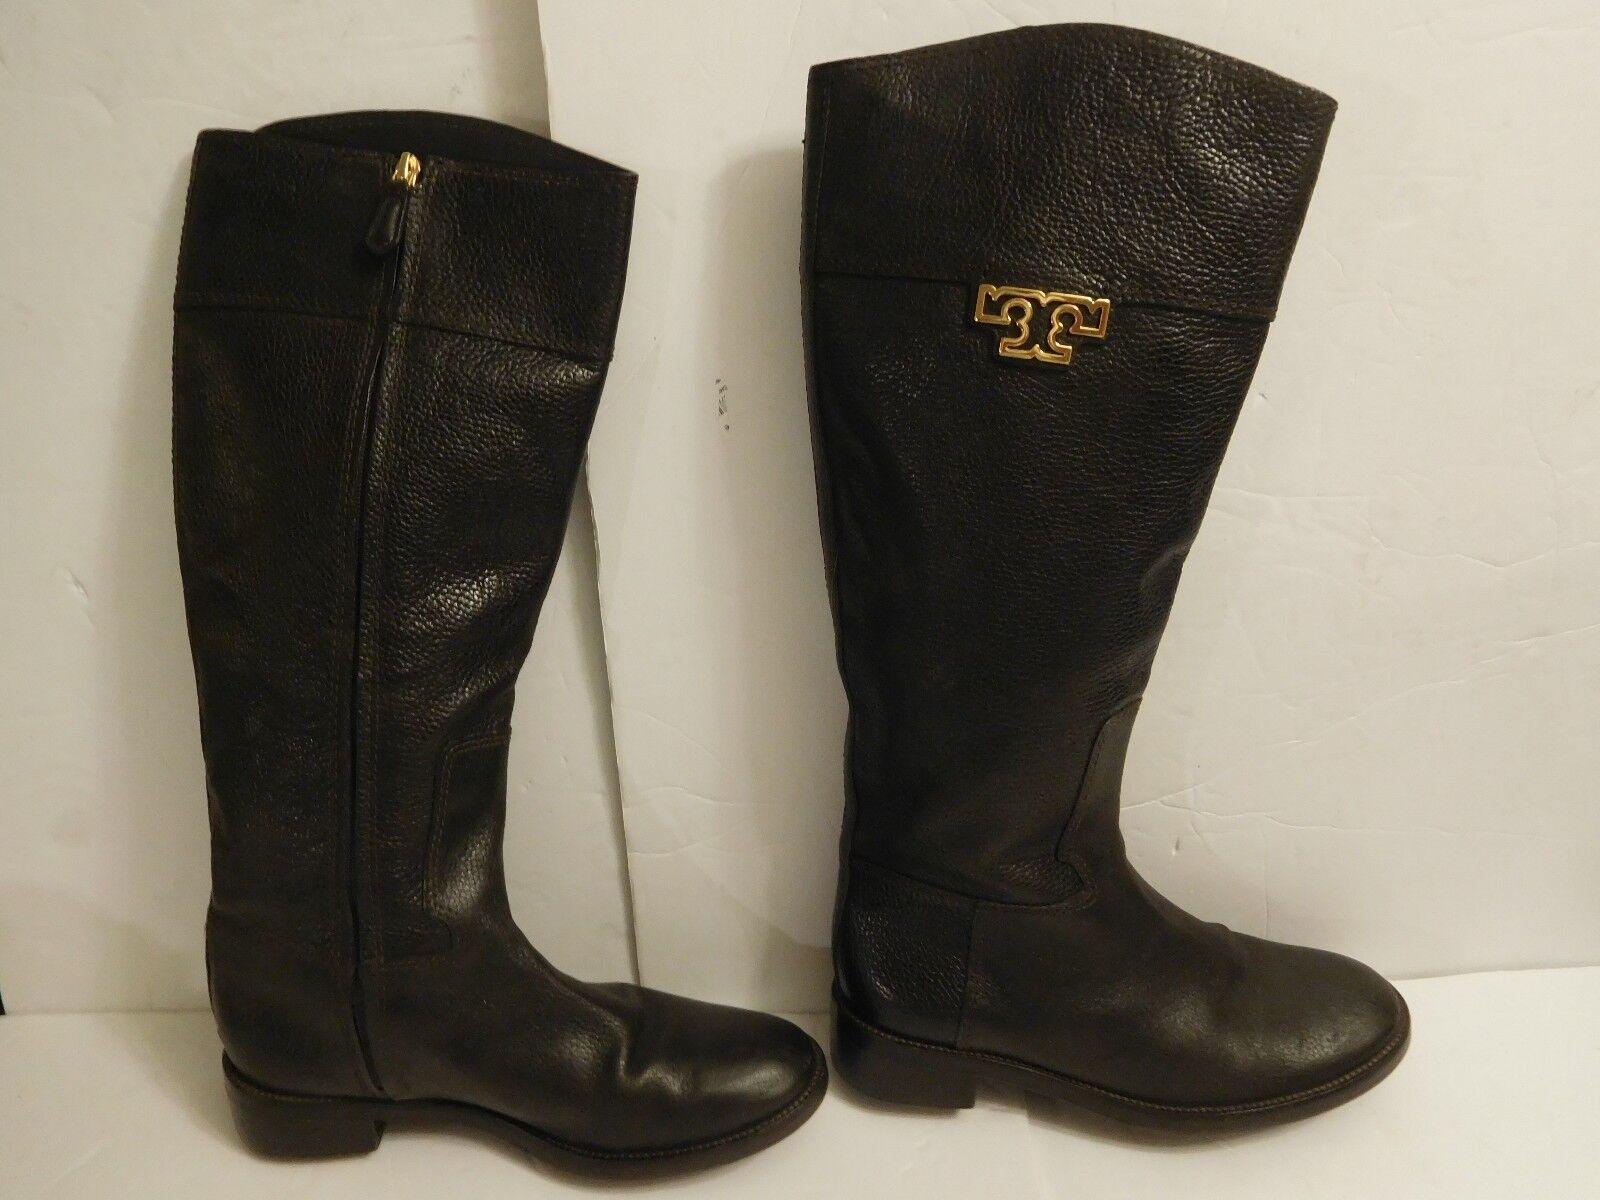 B-30 WOMEN Tory Burch Joanna Tall Riding Boots Brown Leather T Logo Sz 9 M